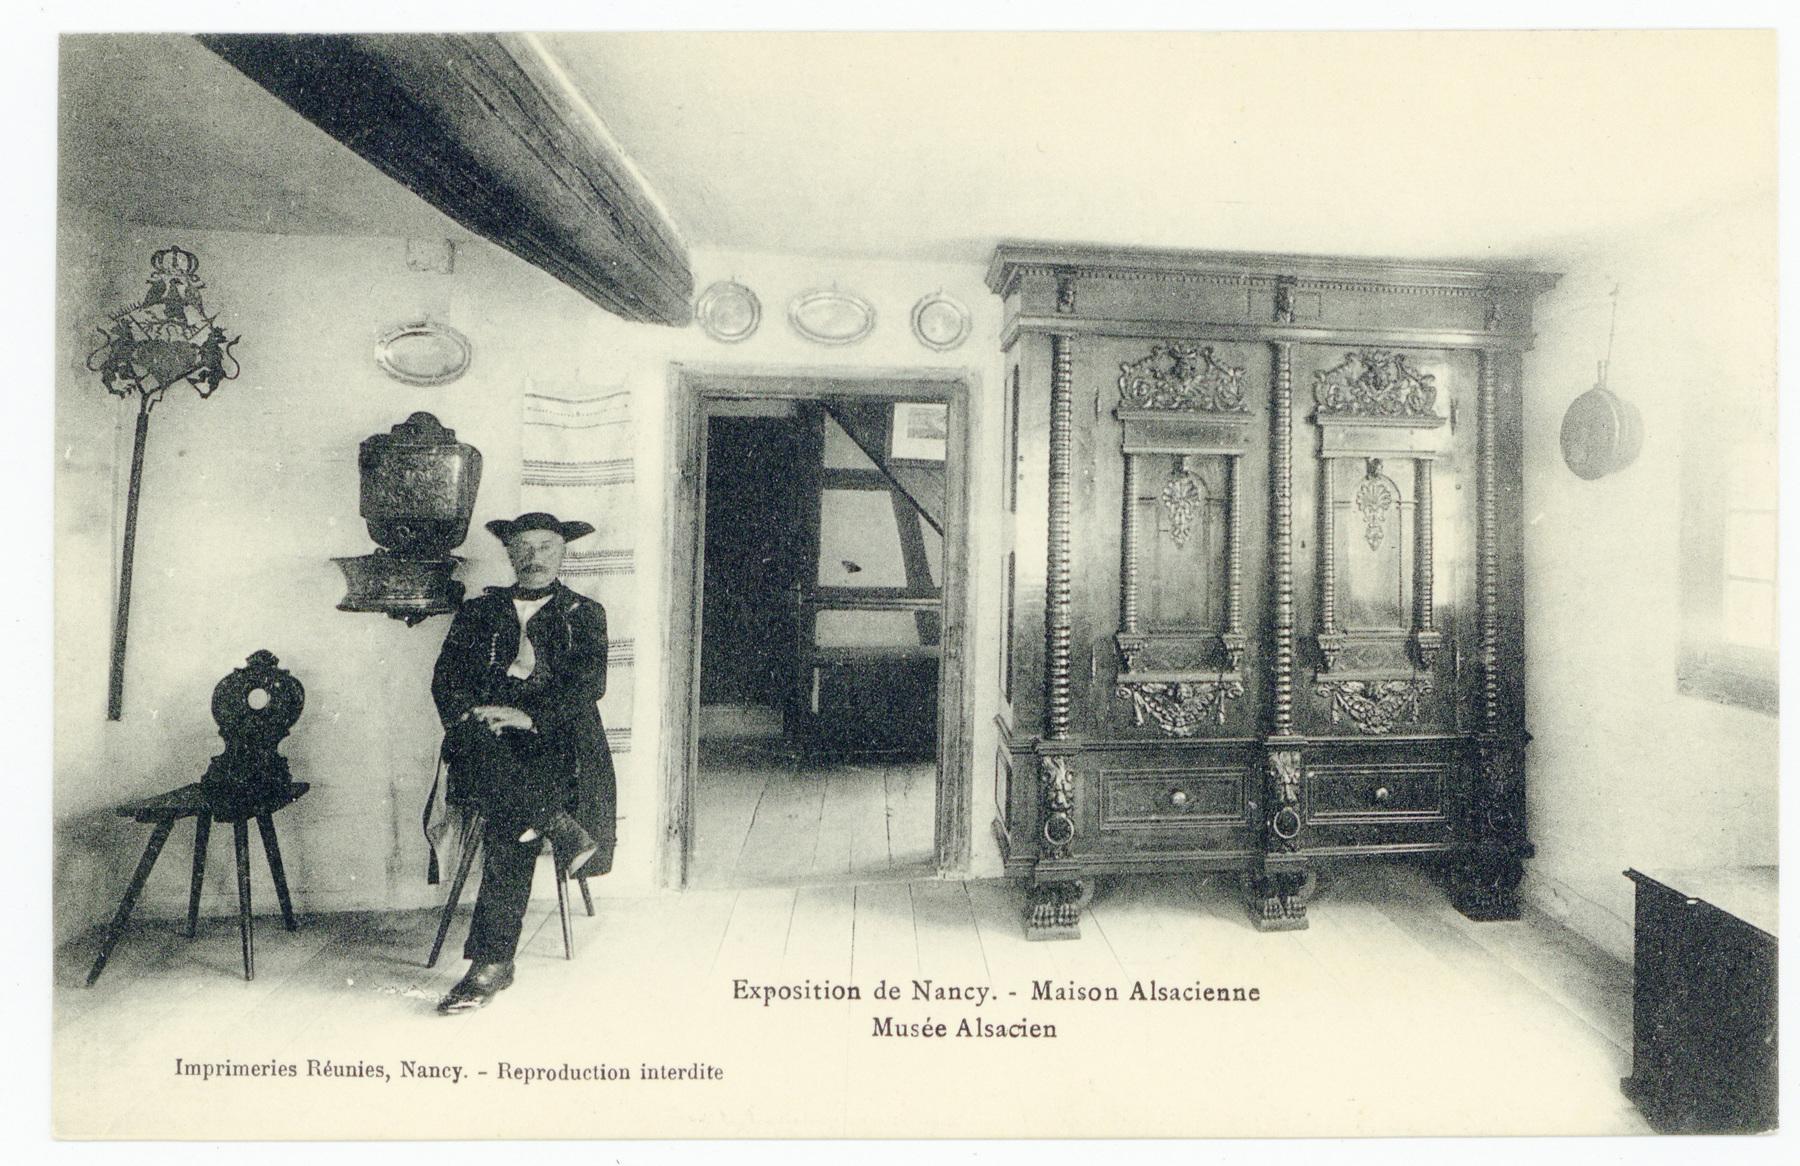 Contenu du Musée Alsacien